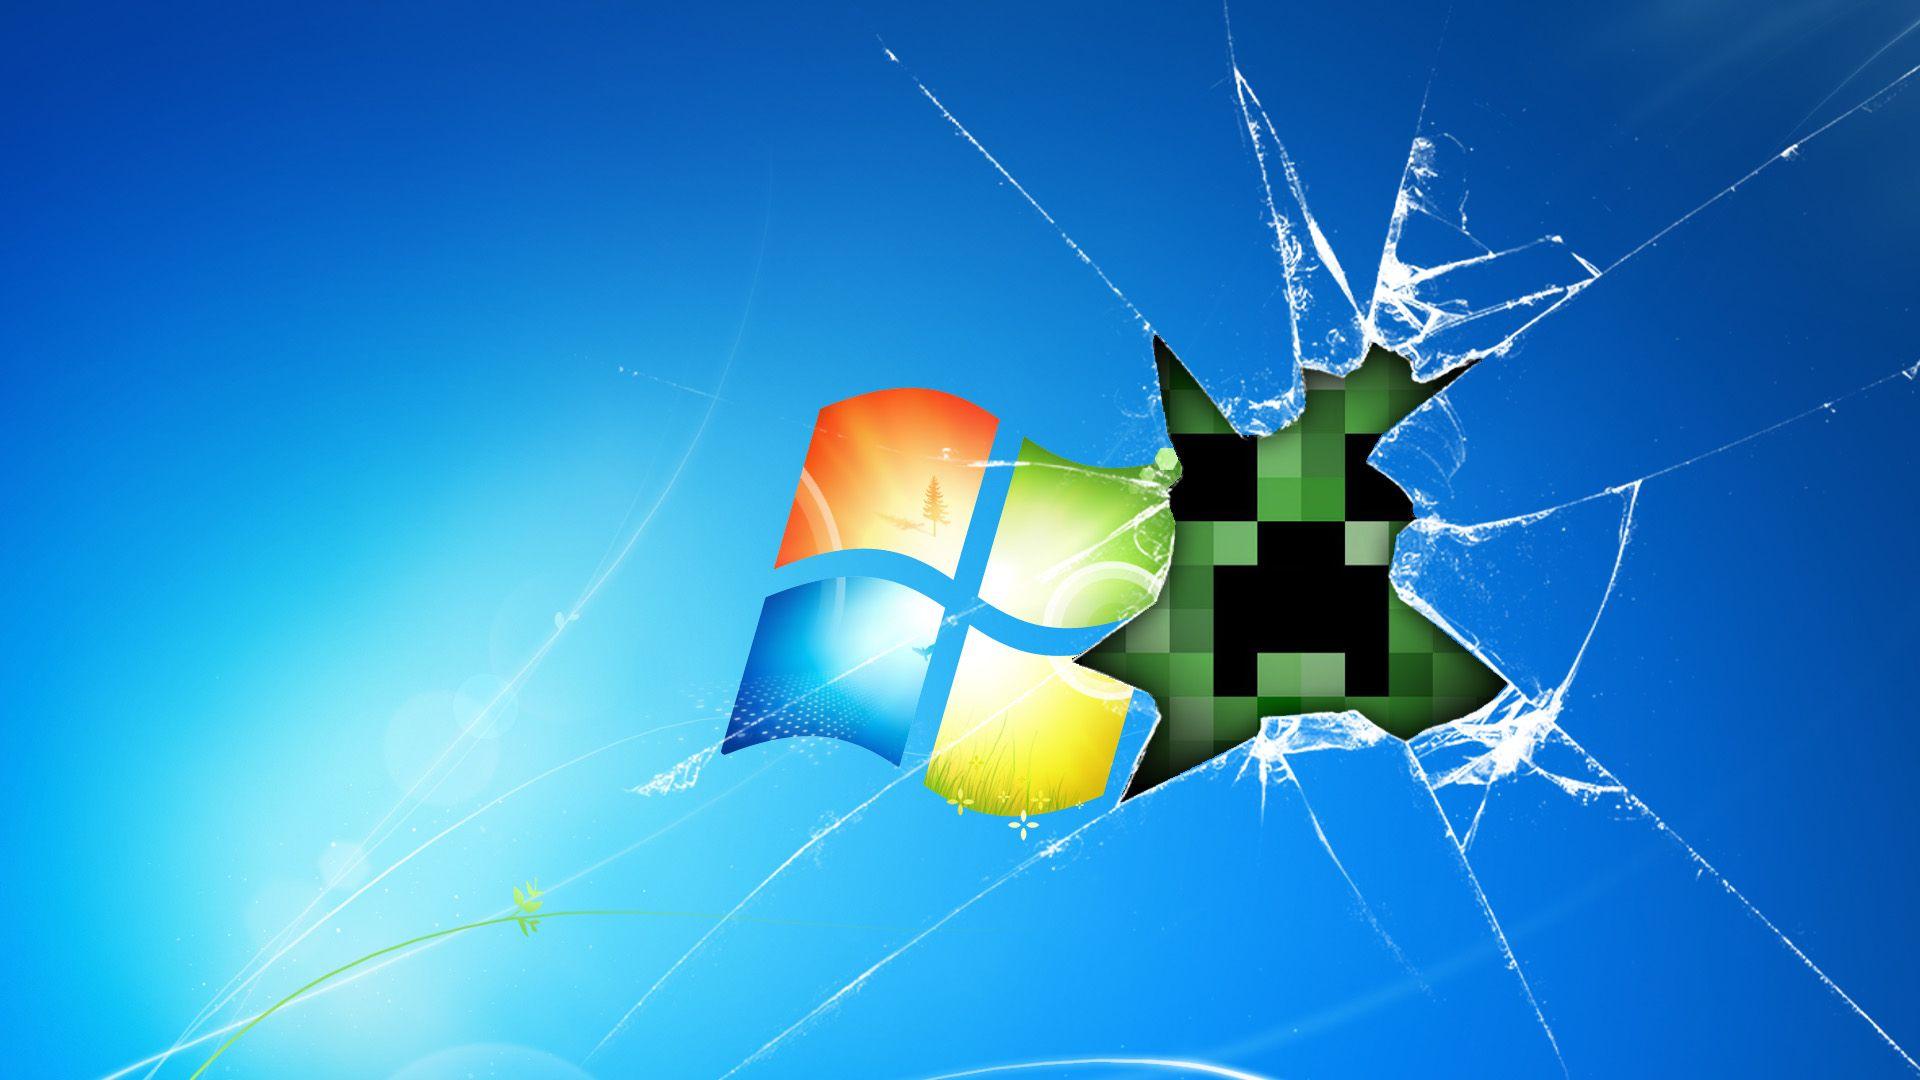 Minecraftwallpaperhd Com Minecraft Wallpaper Minecraft Pictures Windows Wallpaper